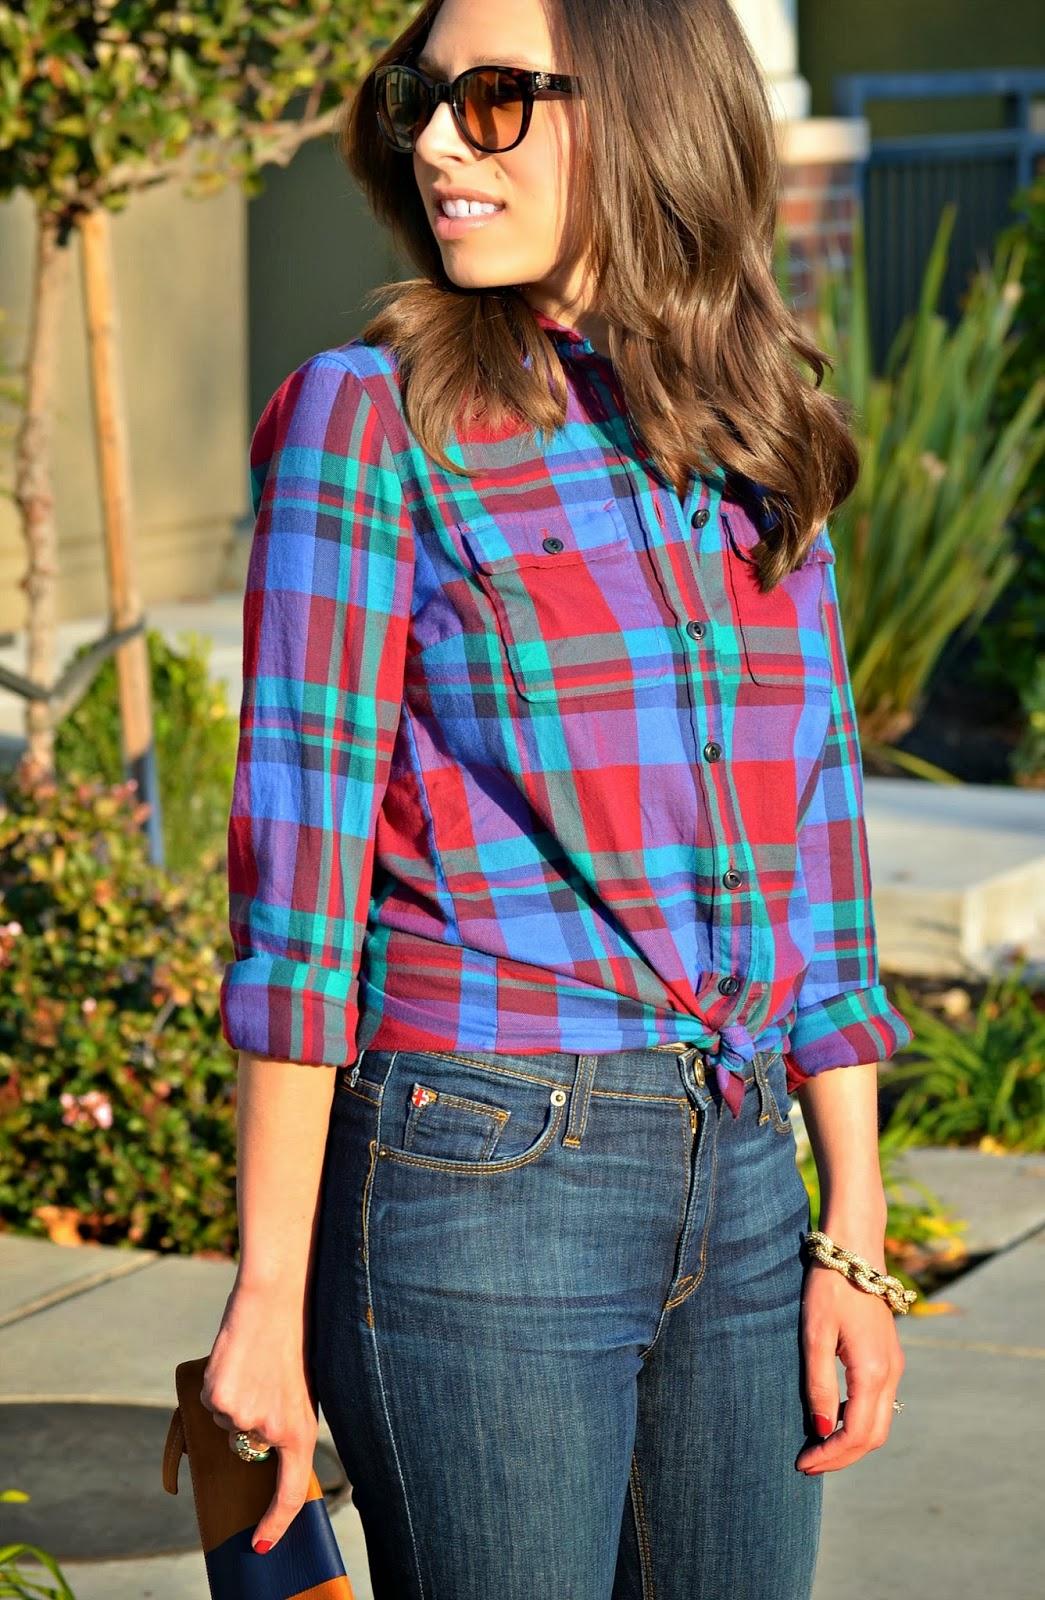 Dress up your Jcrew flannel